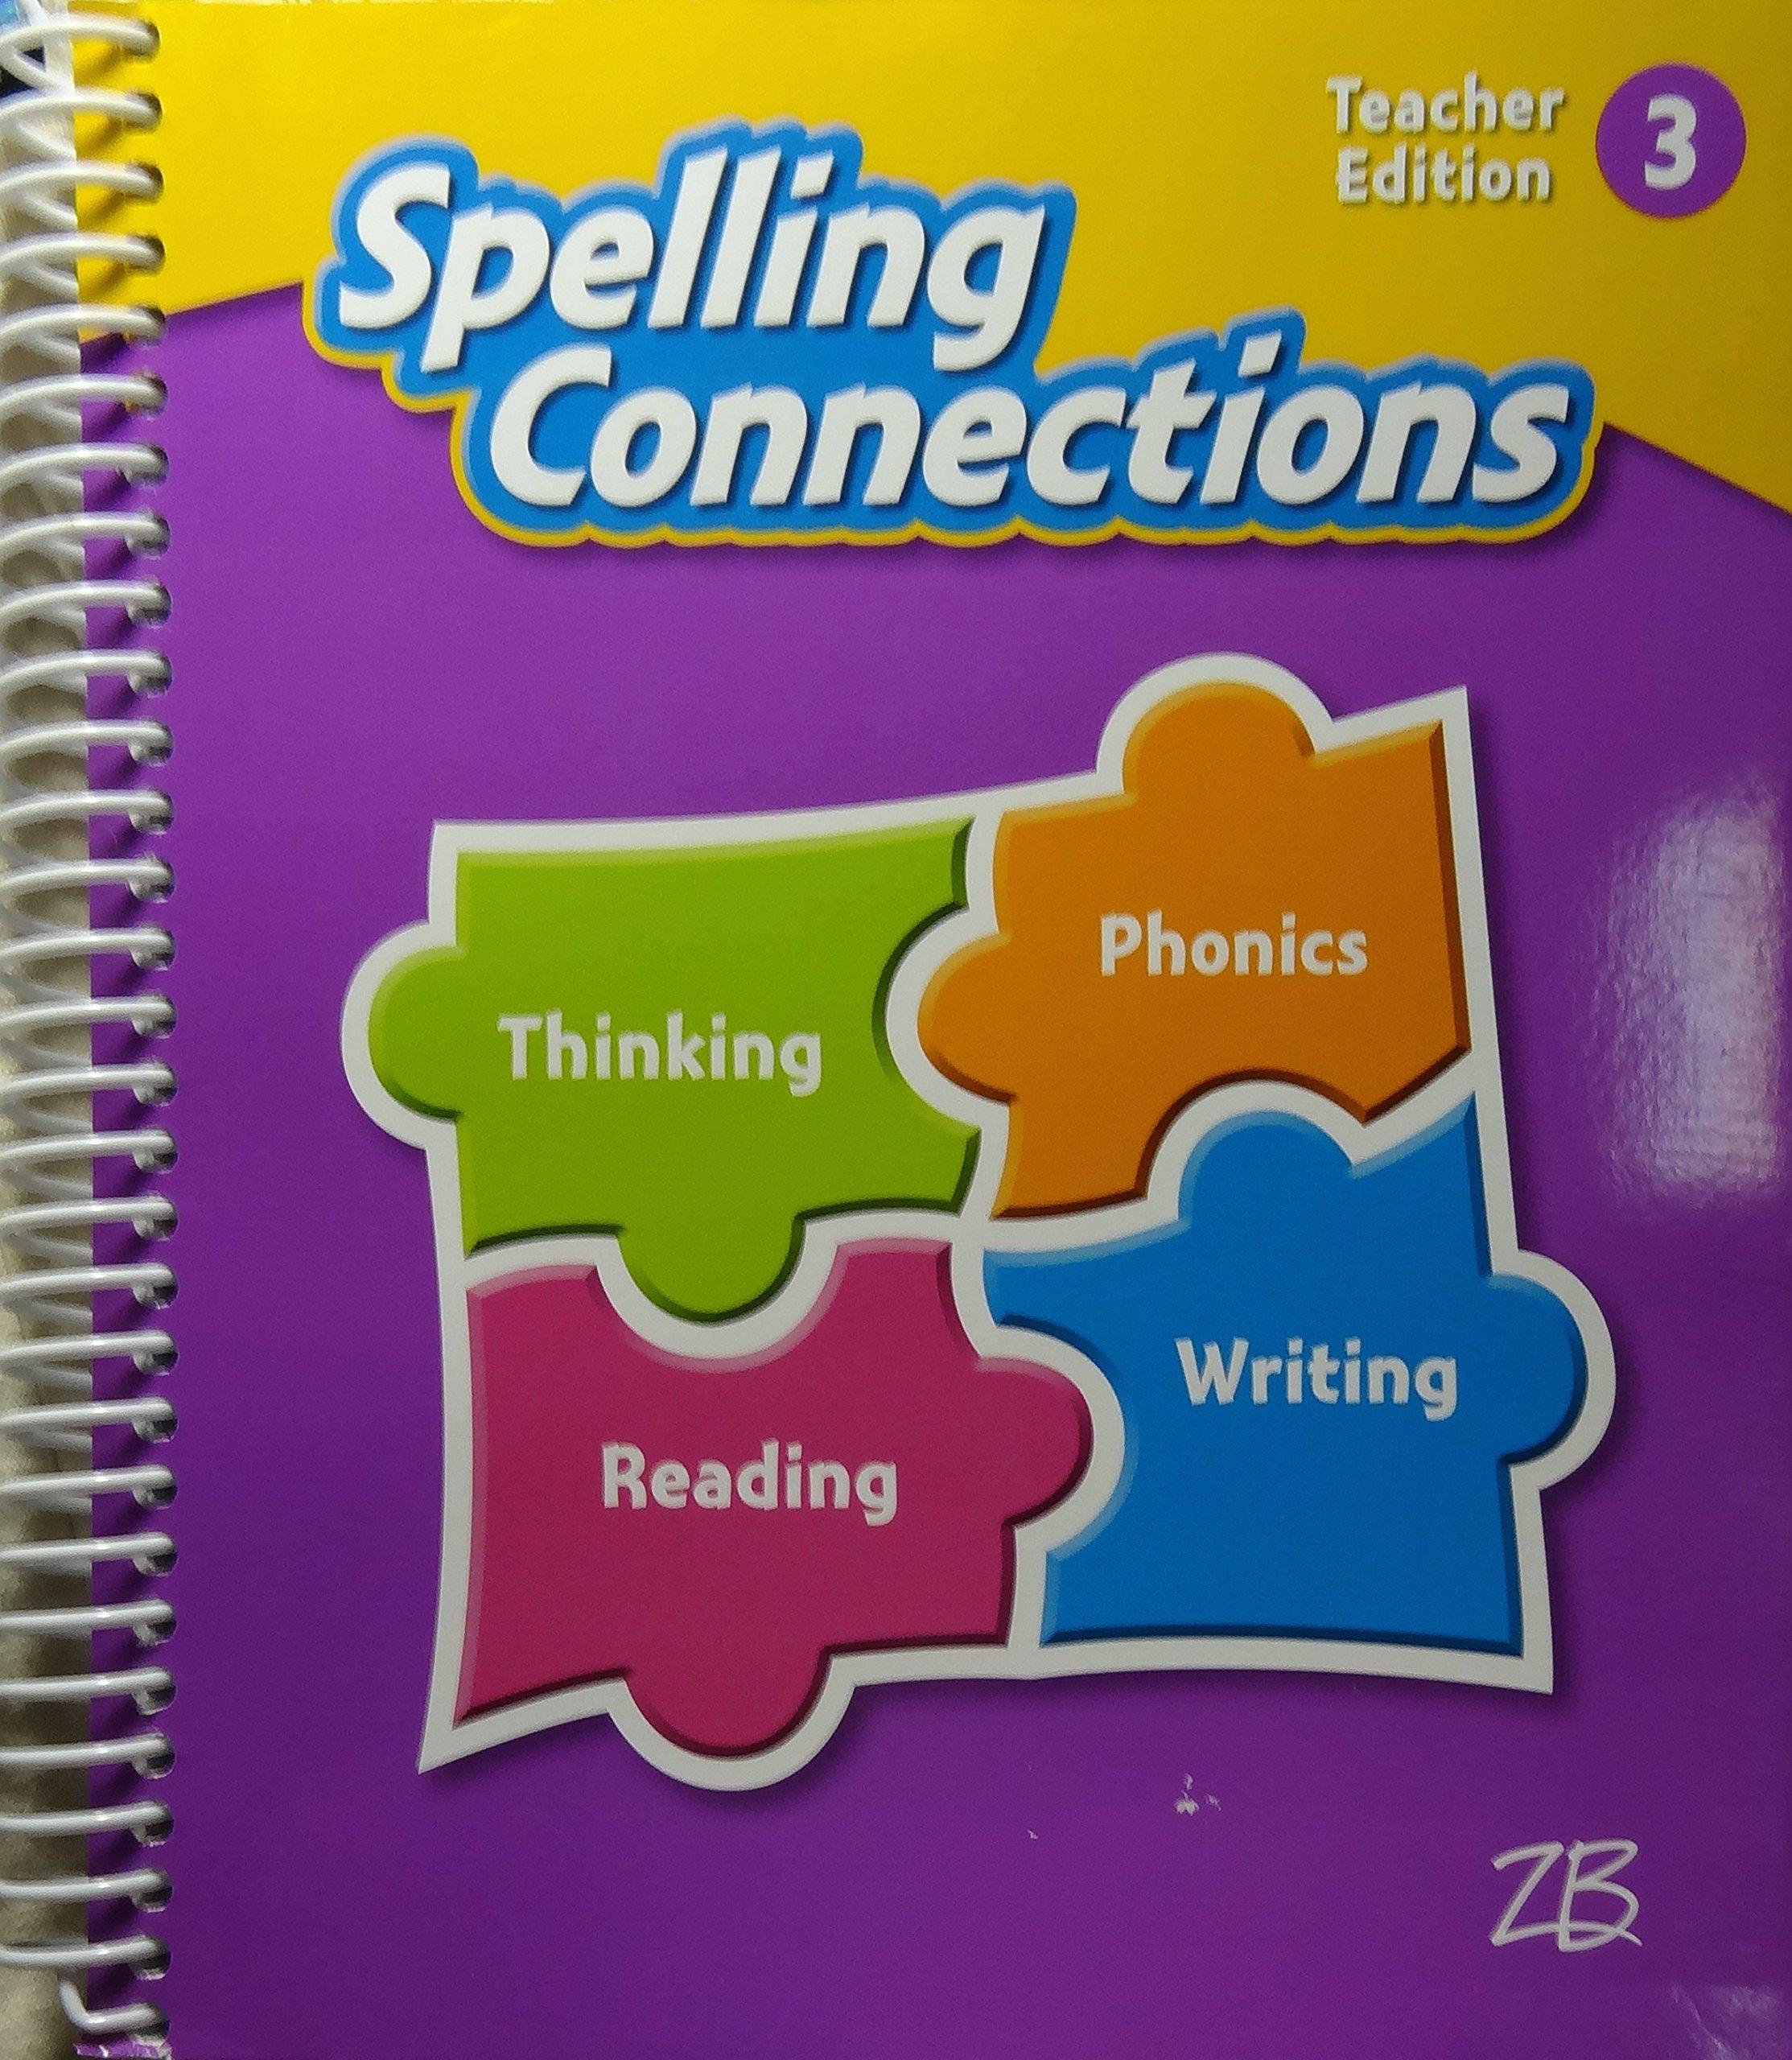 Zaner-Bloser Spelling Connections 2016: Teacher Edition Grade 3 ebook